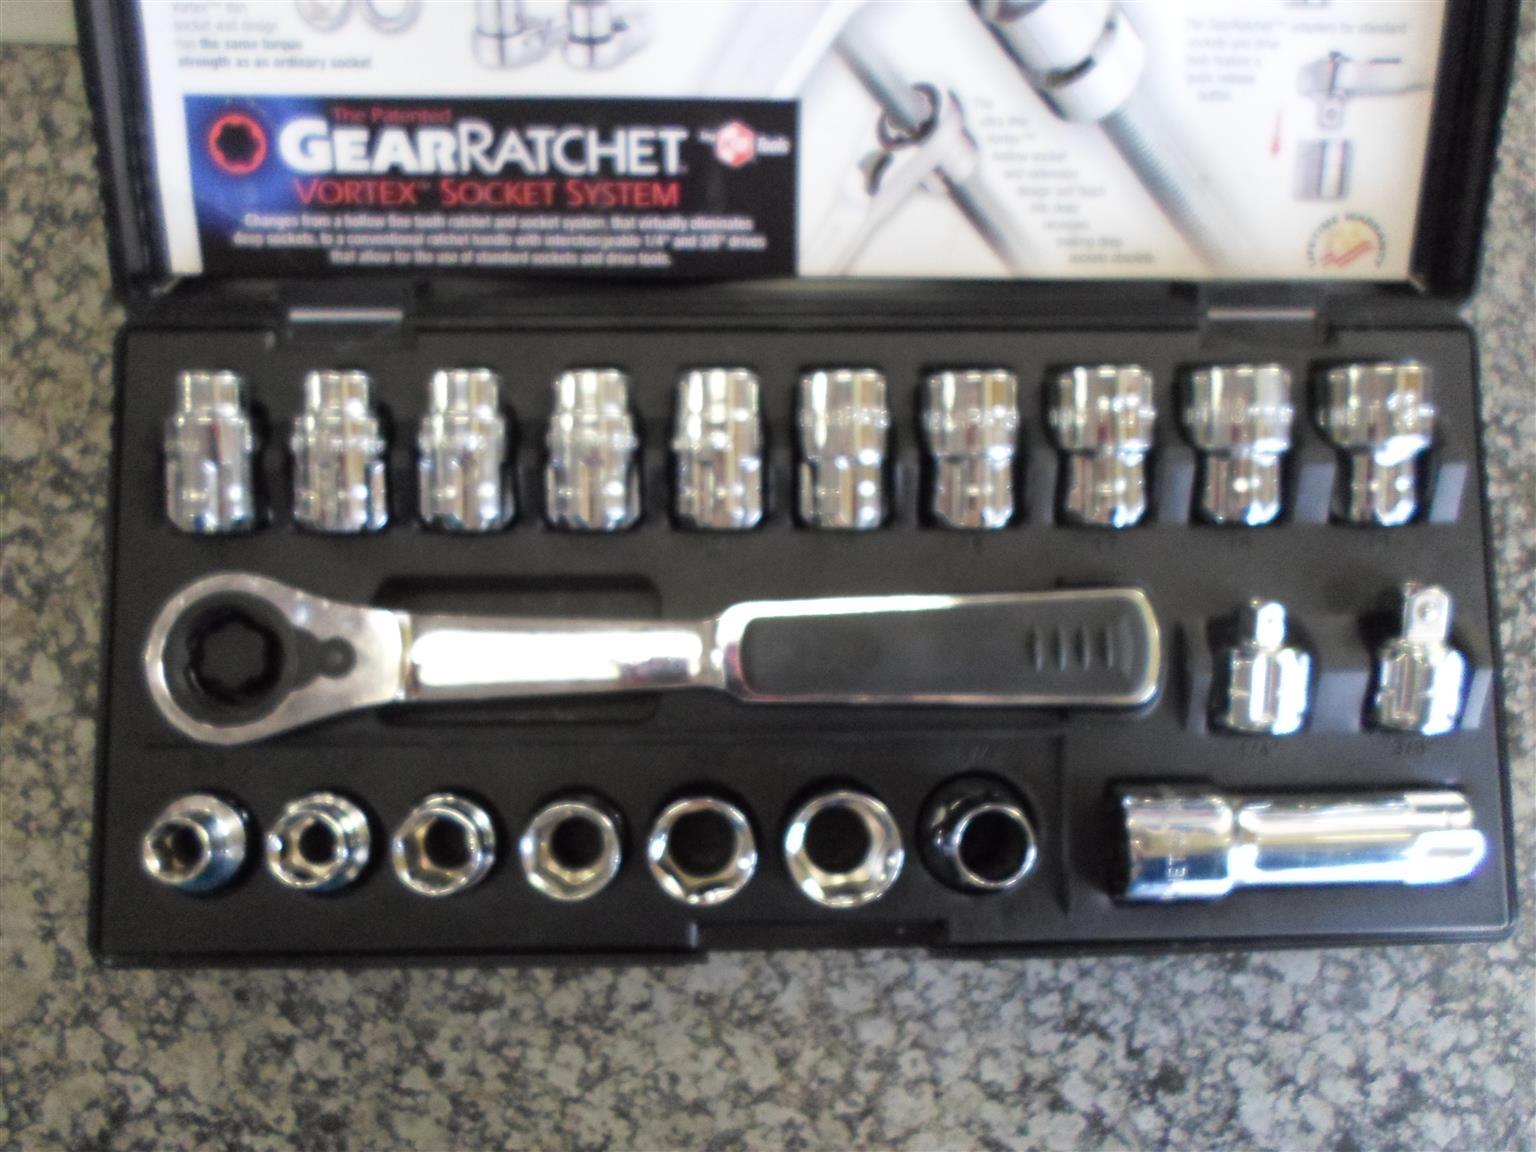 Gear Ratchet Vortex Socket System